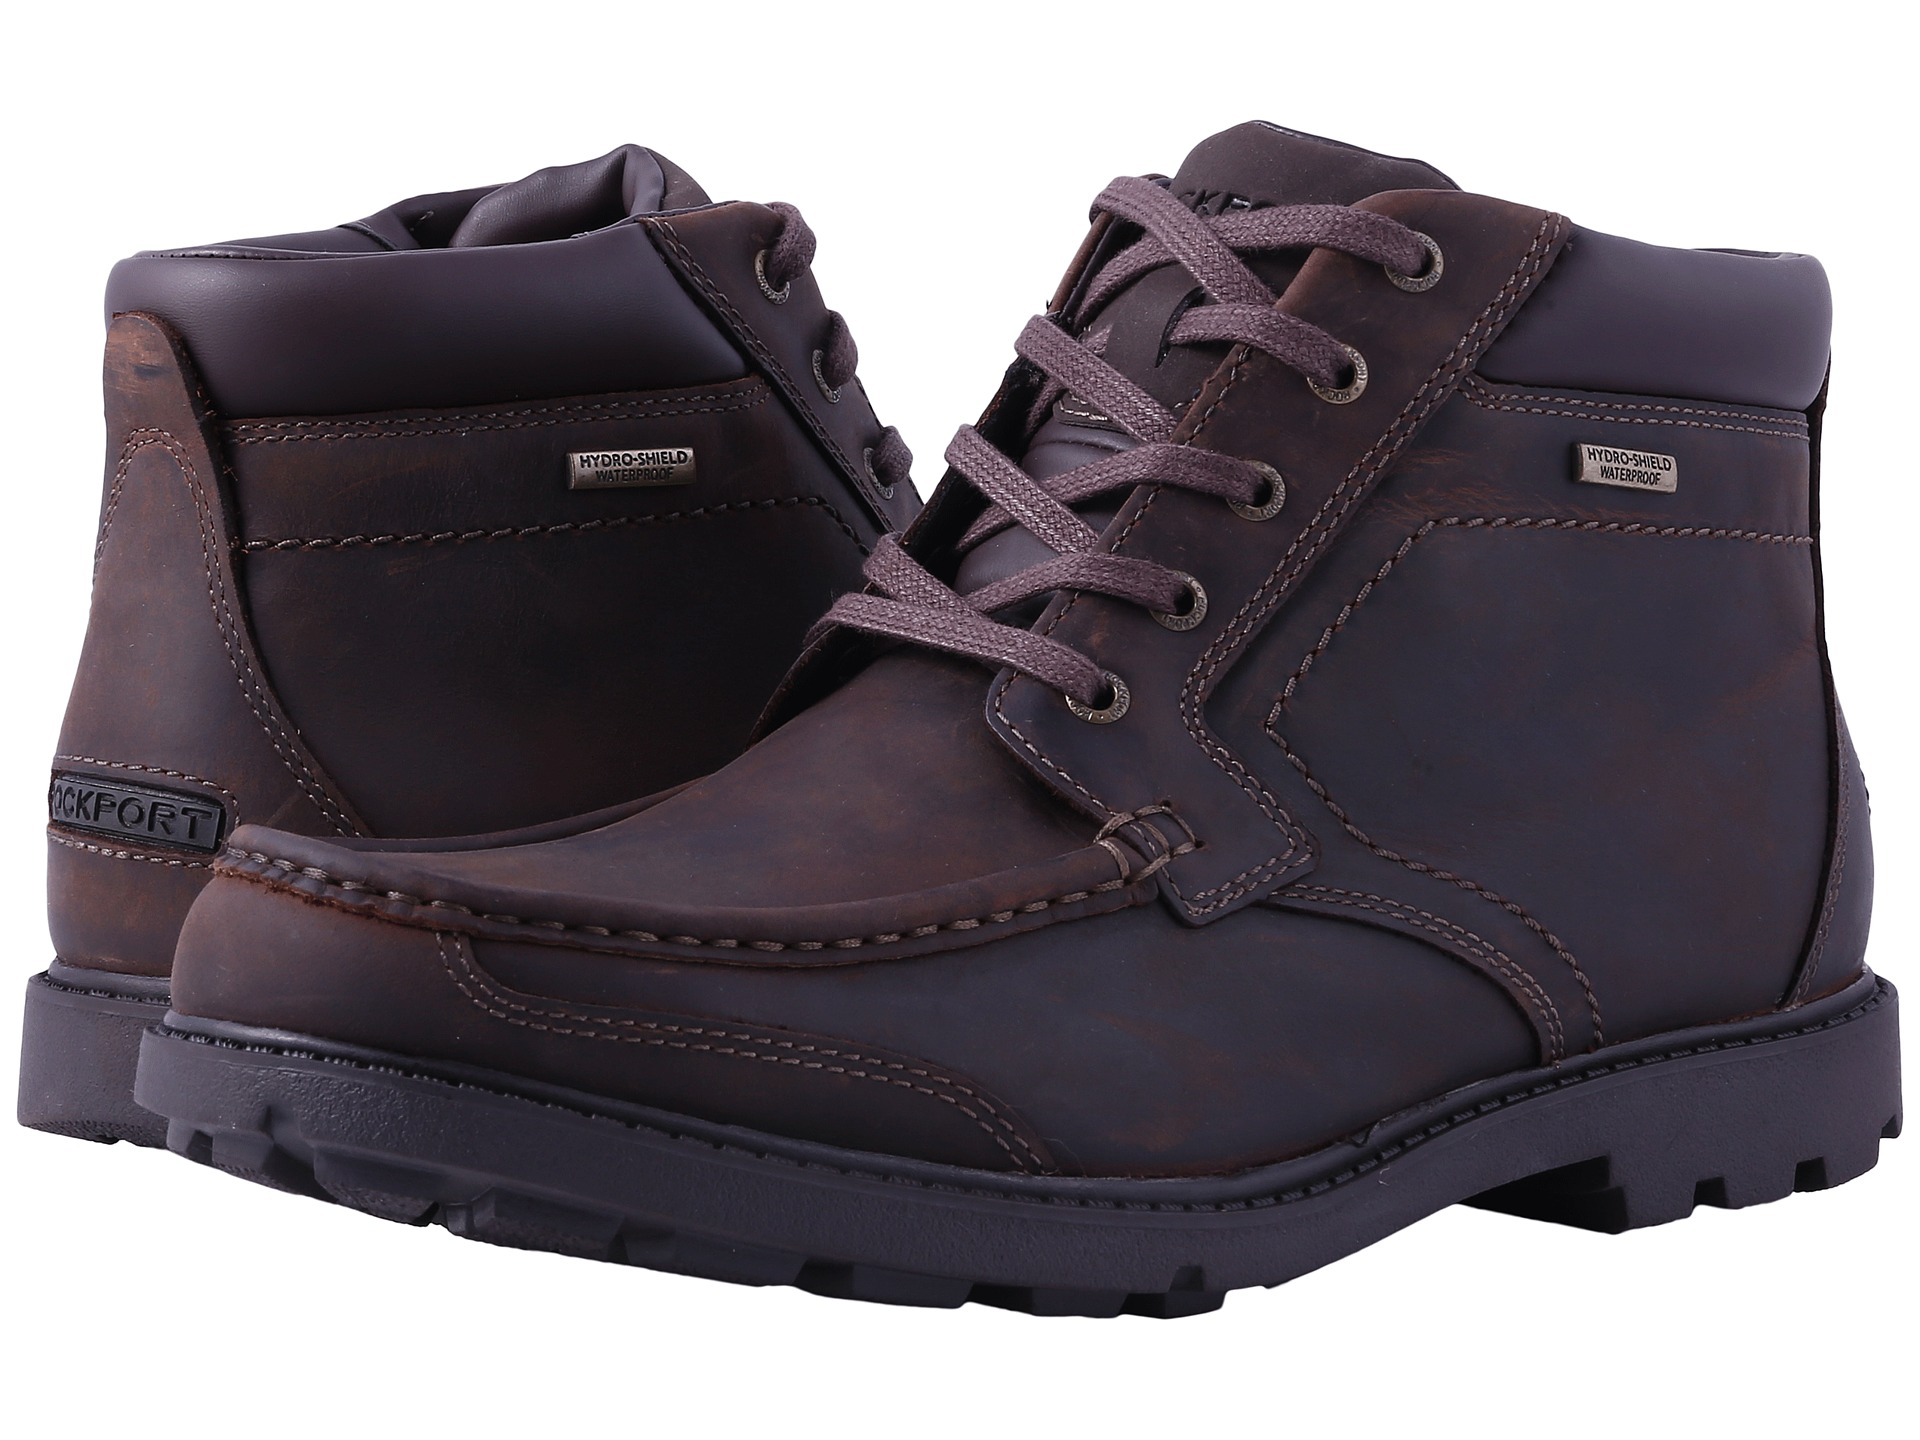 Rockport rugged bucks moc boot waterproof dark tan zappos com free